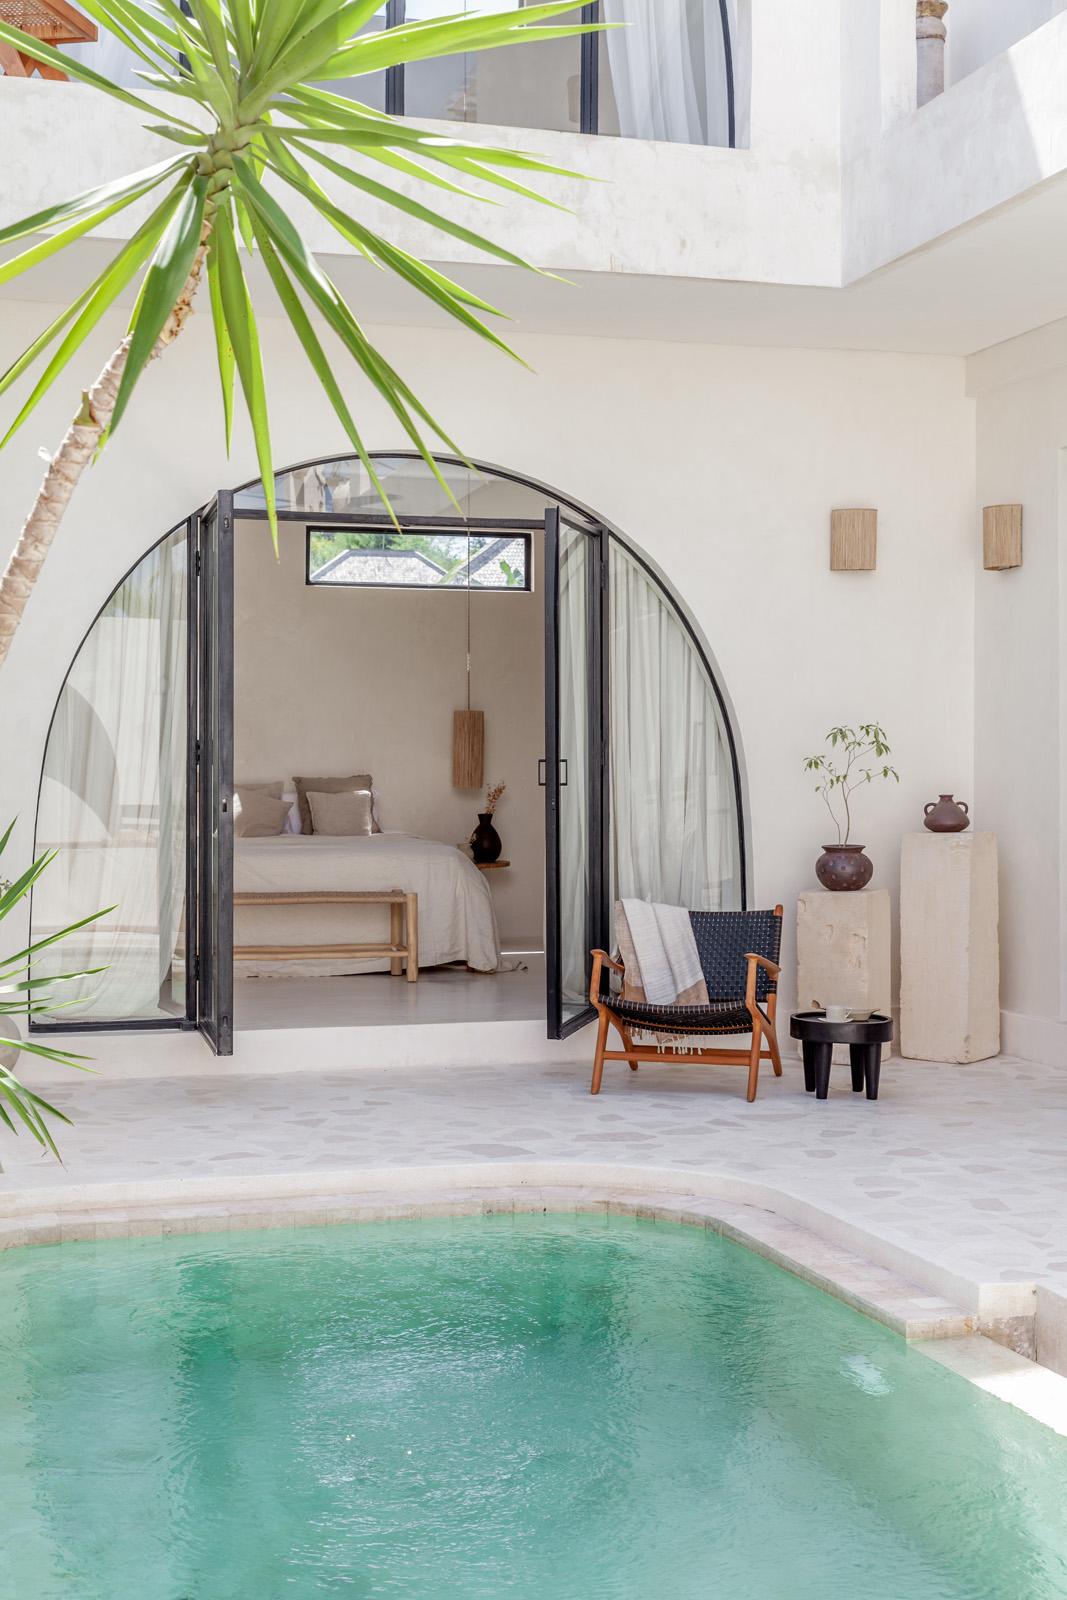 Bali Bungalow, bali interiors, decor, furniture